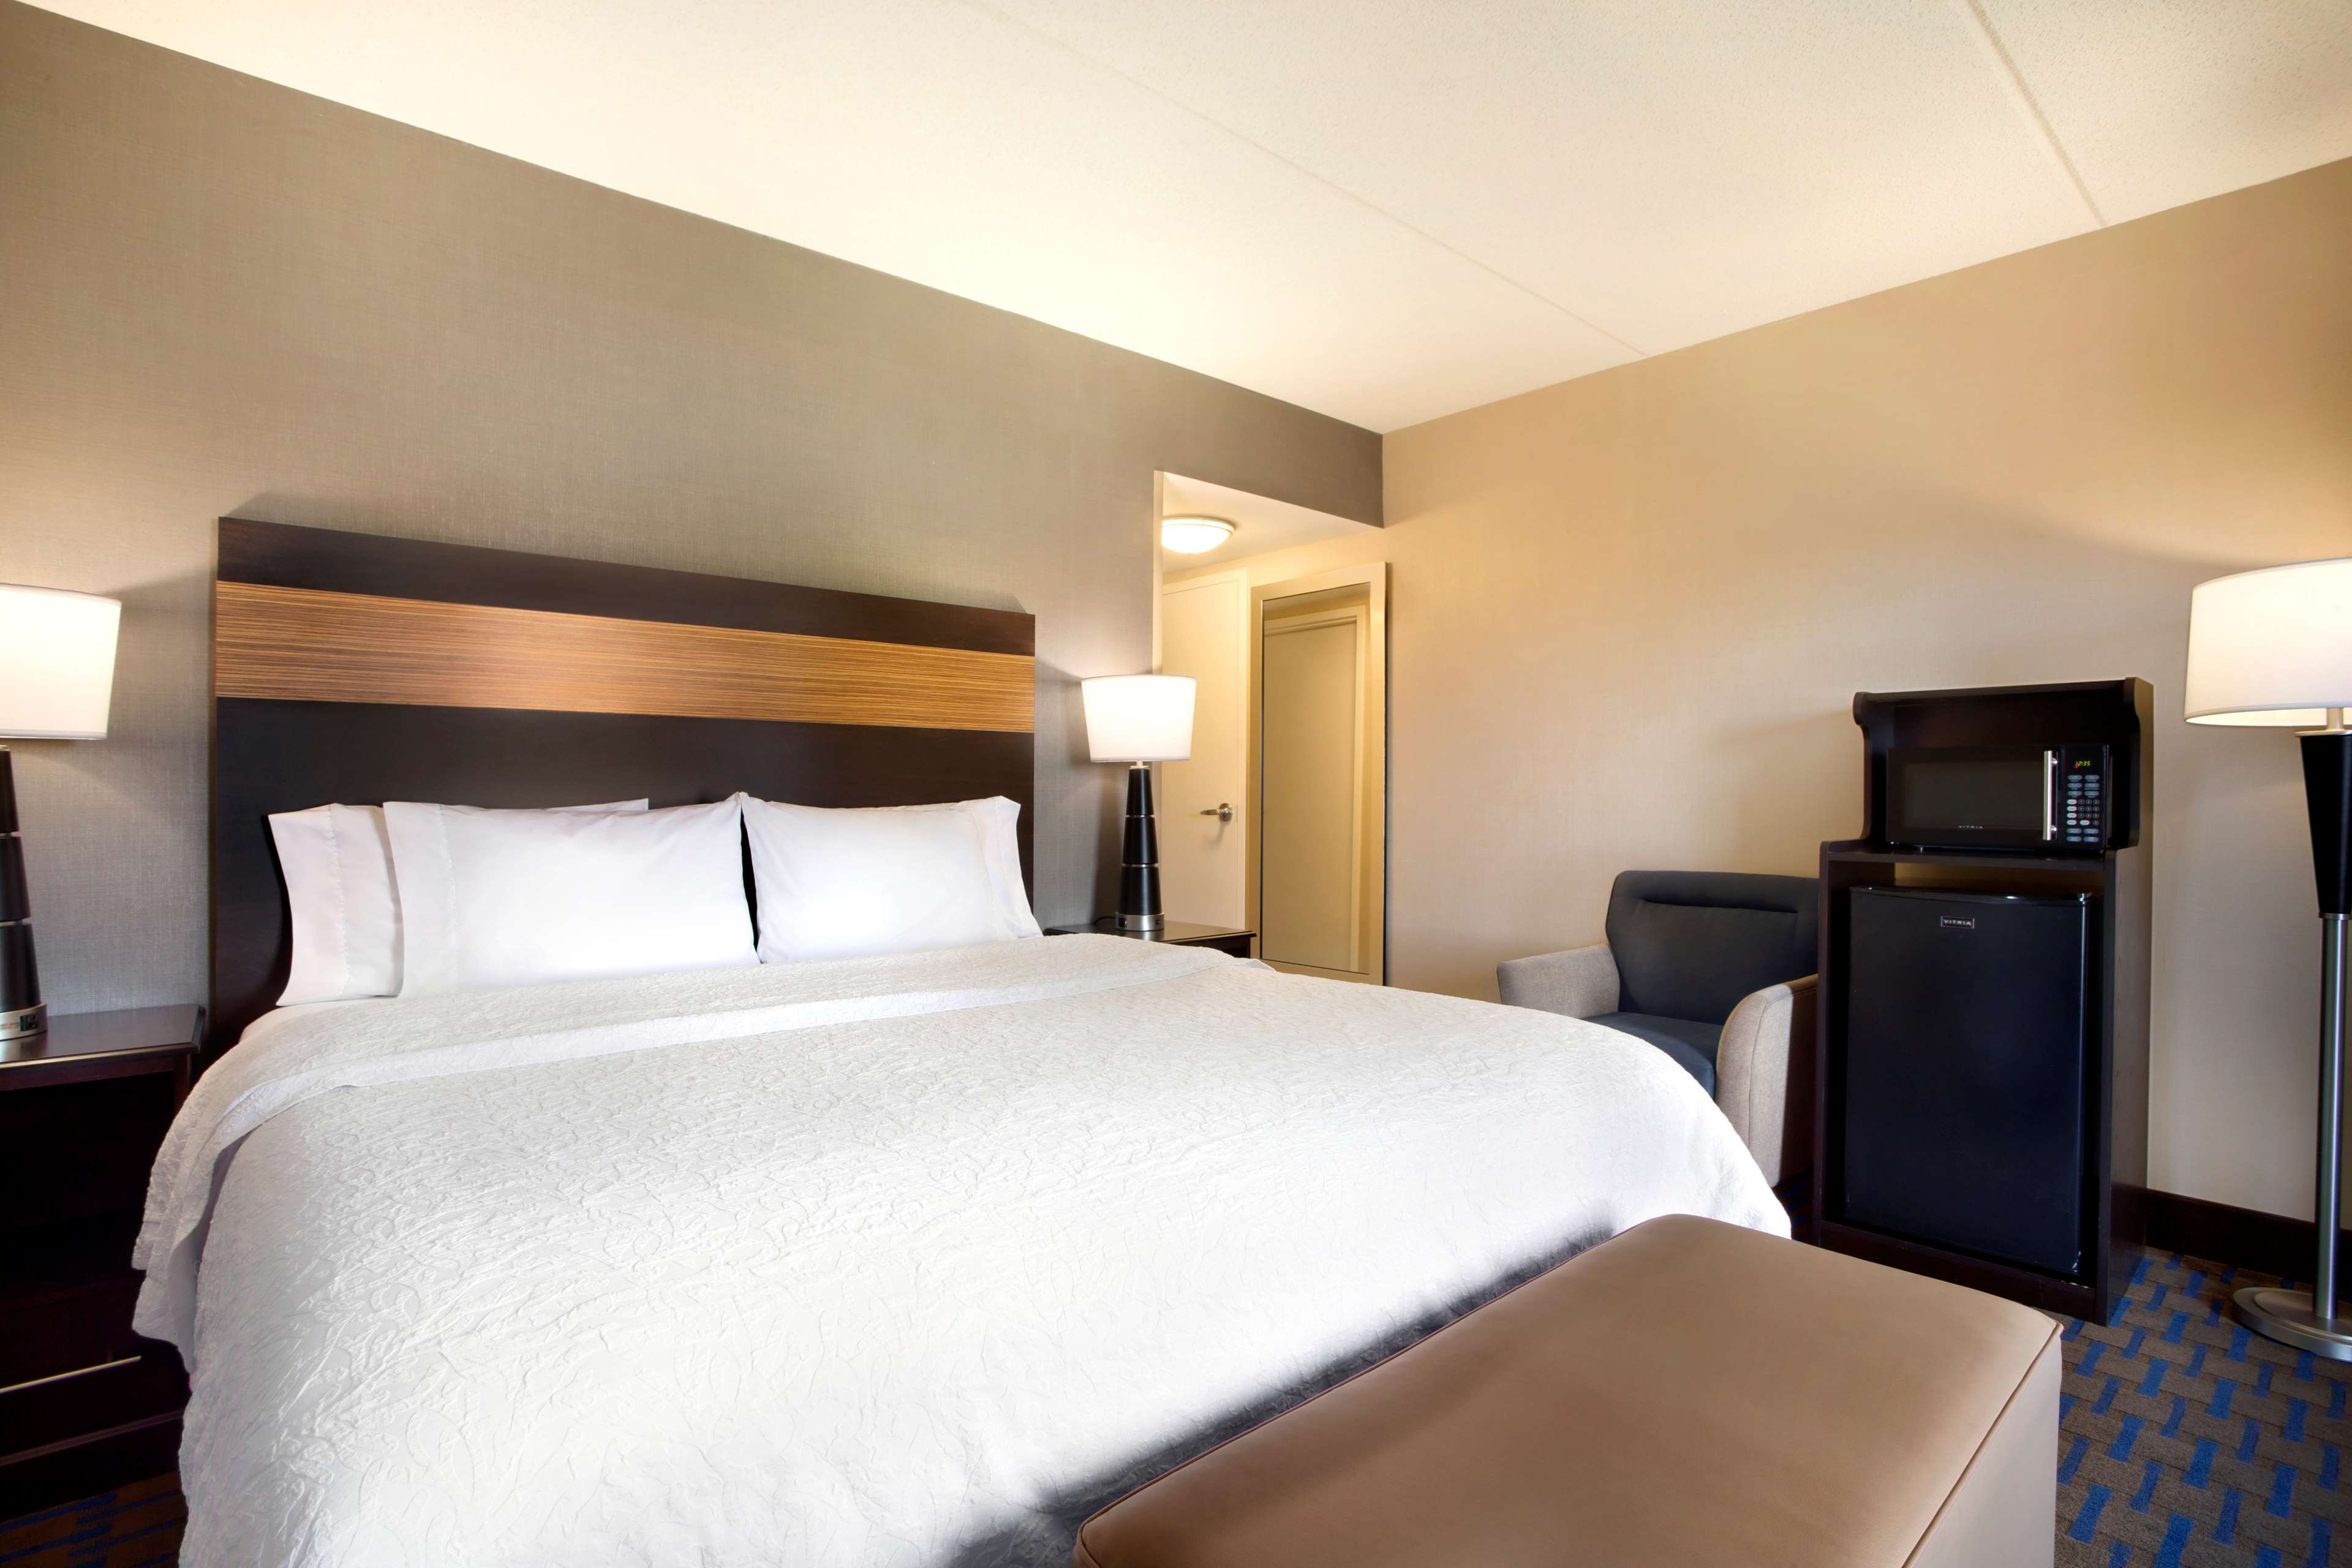 Hampton Inn & Suites Camp Springs/Andrews AFB image 11